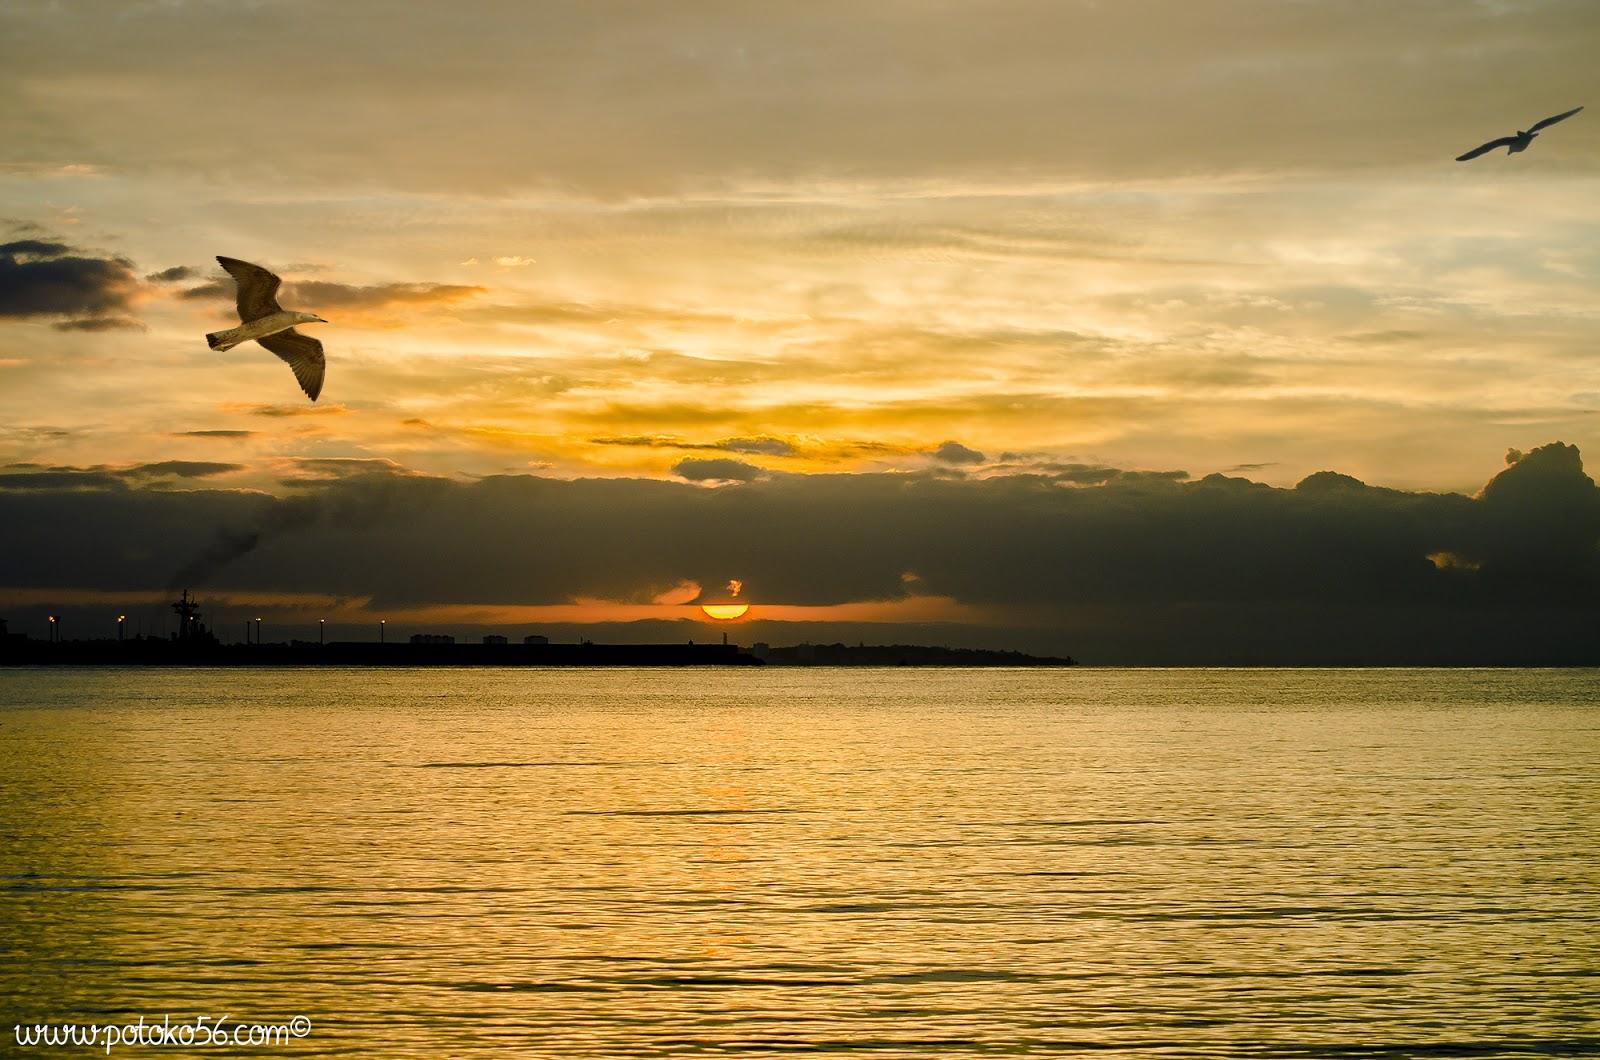 Rota amaneciendo desde la playa testigos las gaviotas